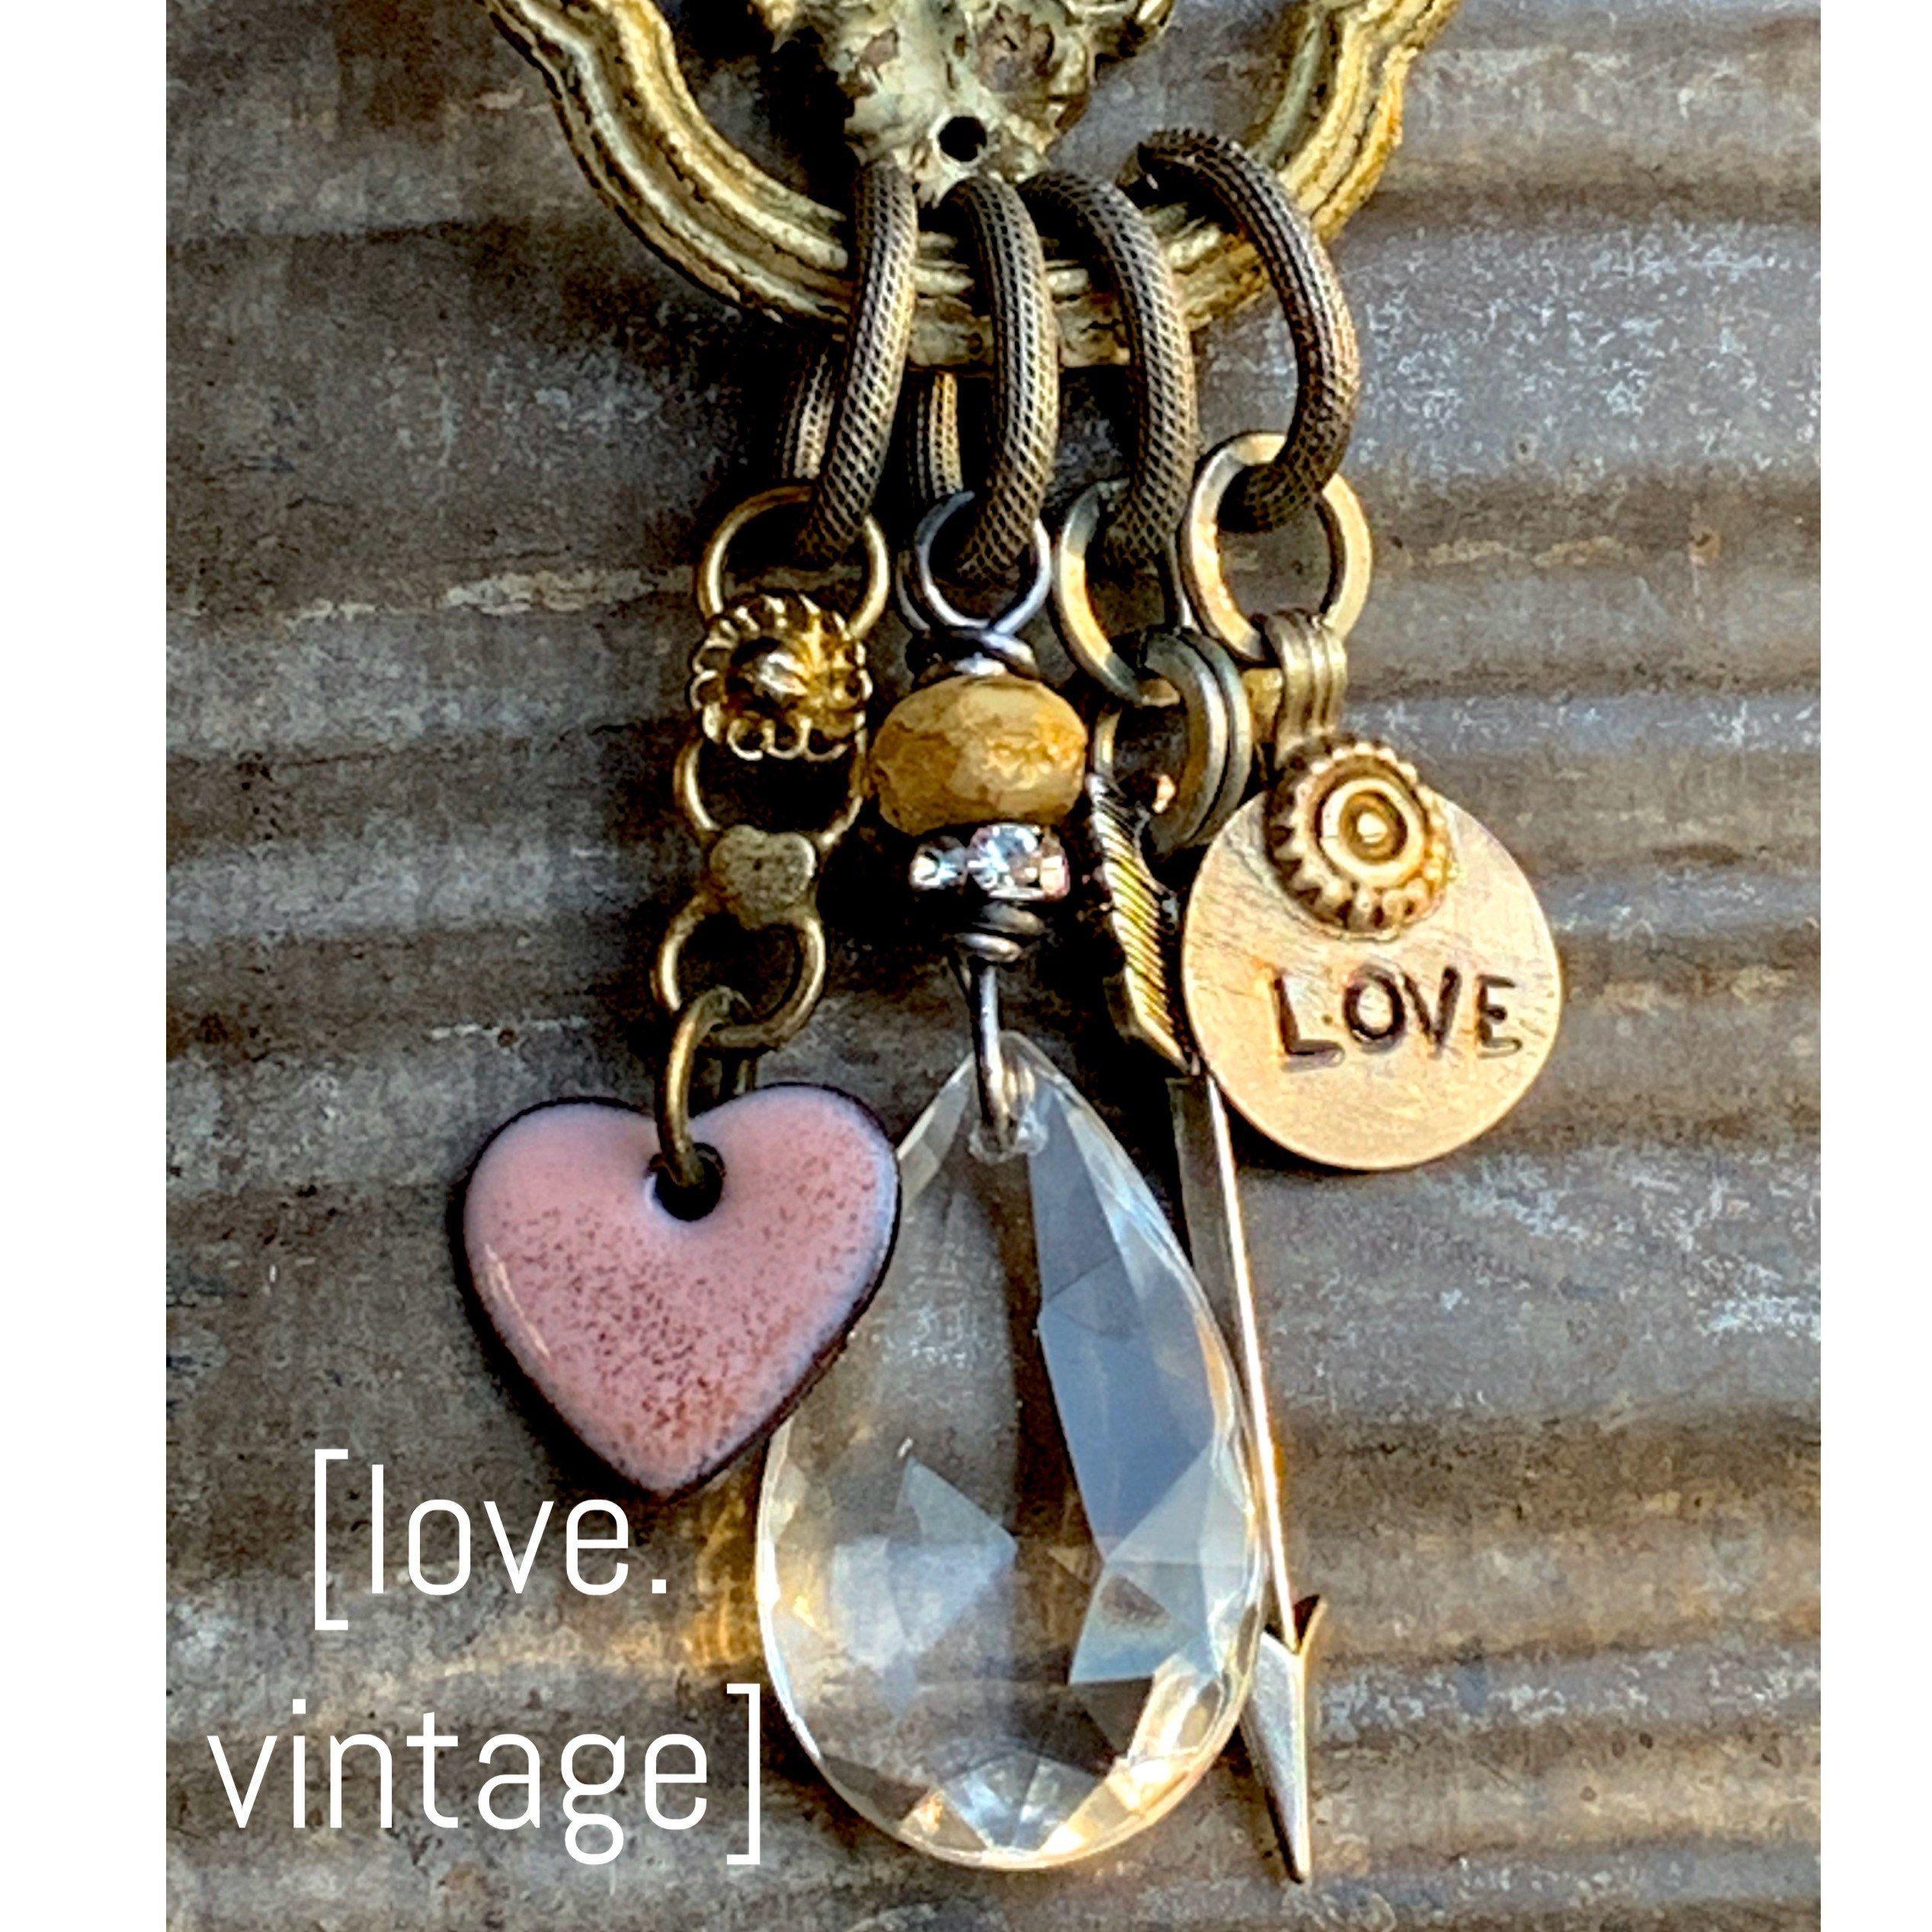 Excited to share this item from my #etsy shop: Vintage Love #enamelheart #vintagejewelry #love #repurposedvintage #vintagehardware